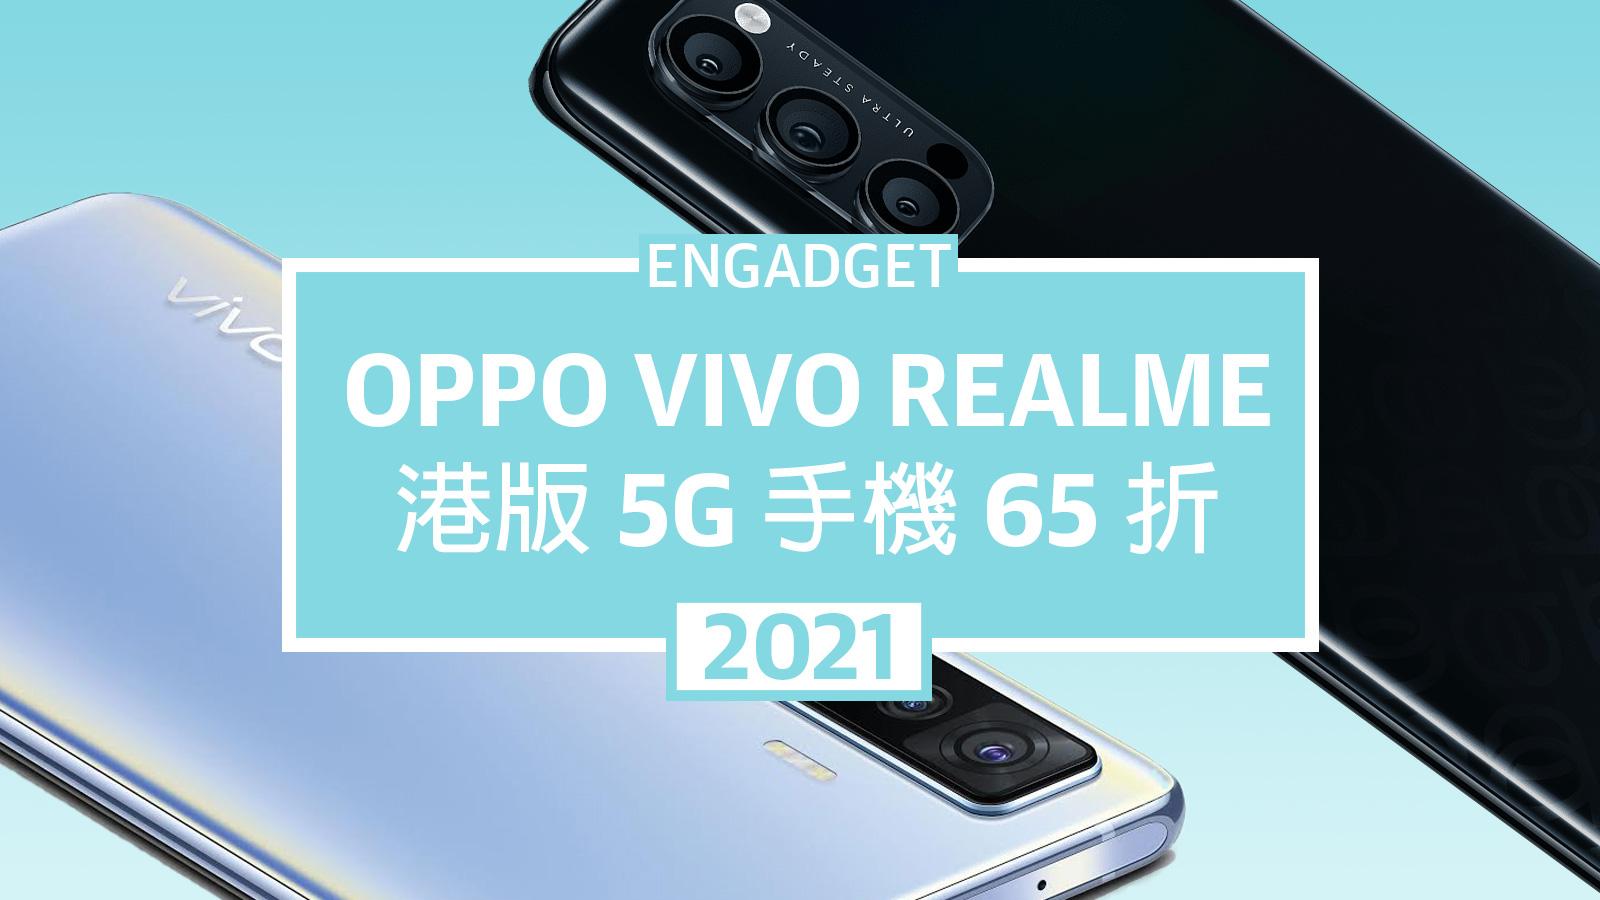 港版 Oppo、Vivo、Realme 5G 手機 65 折優惠